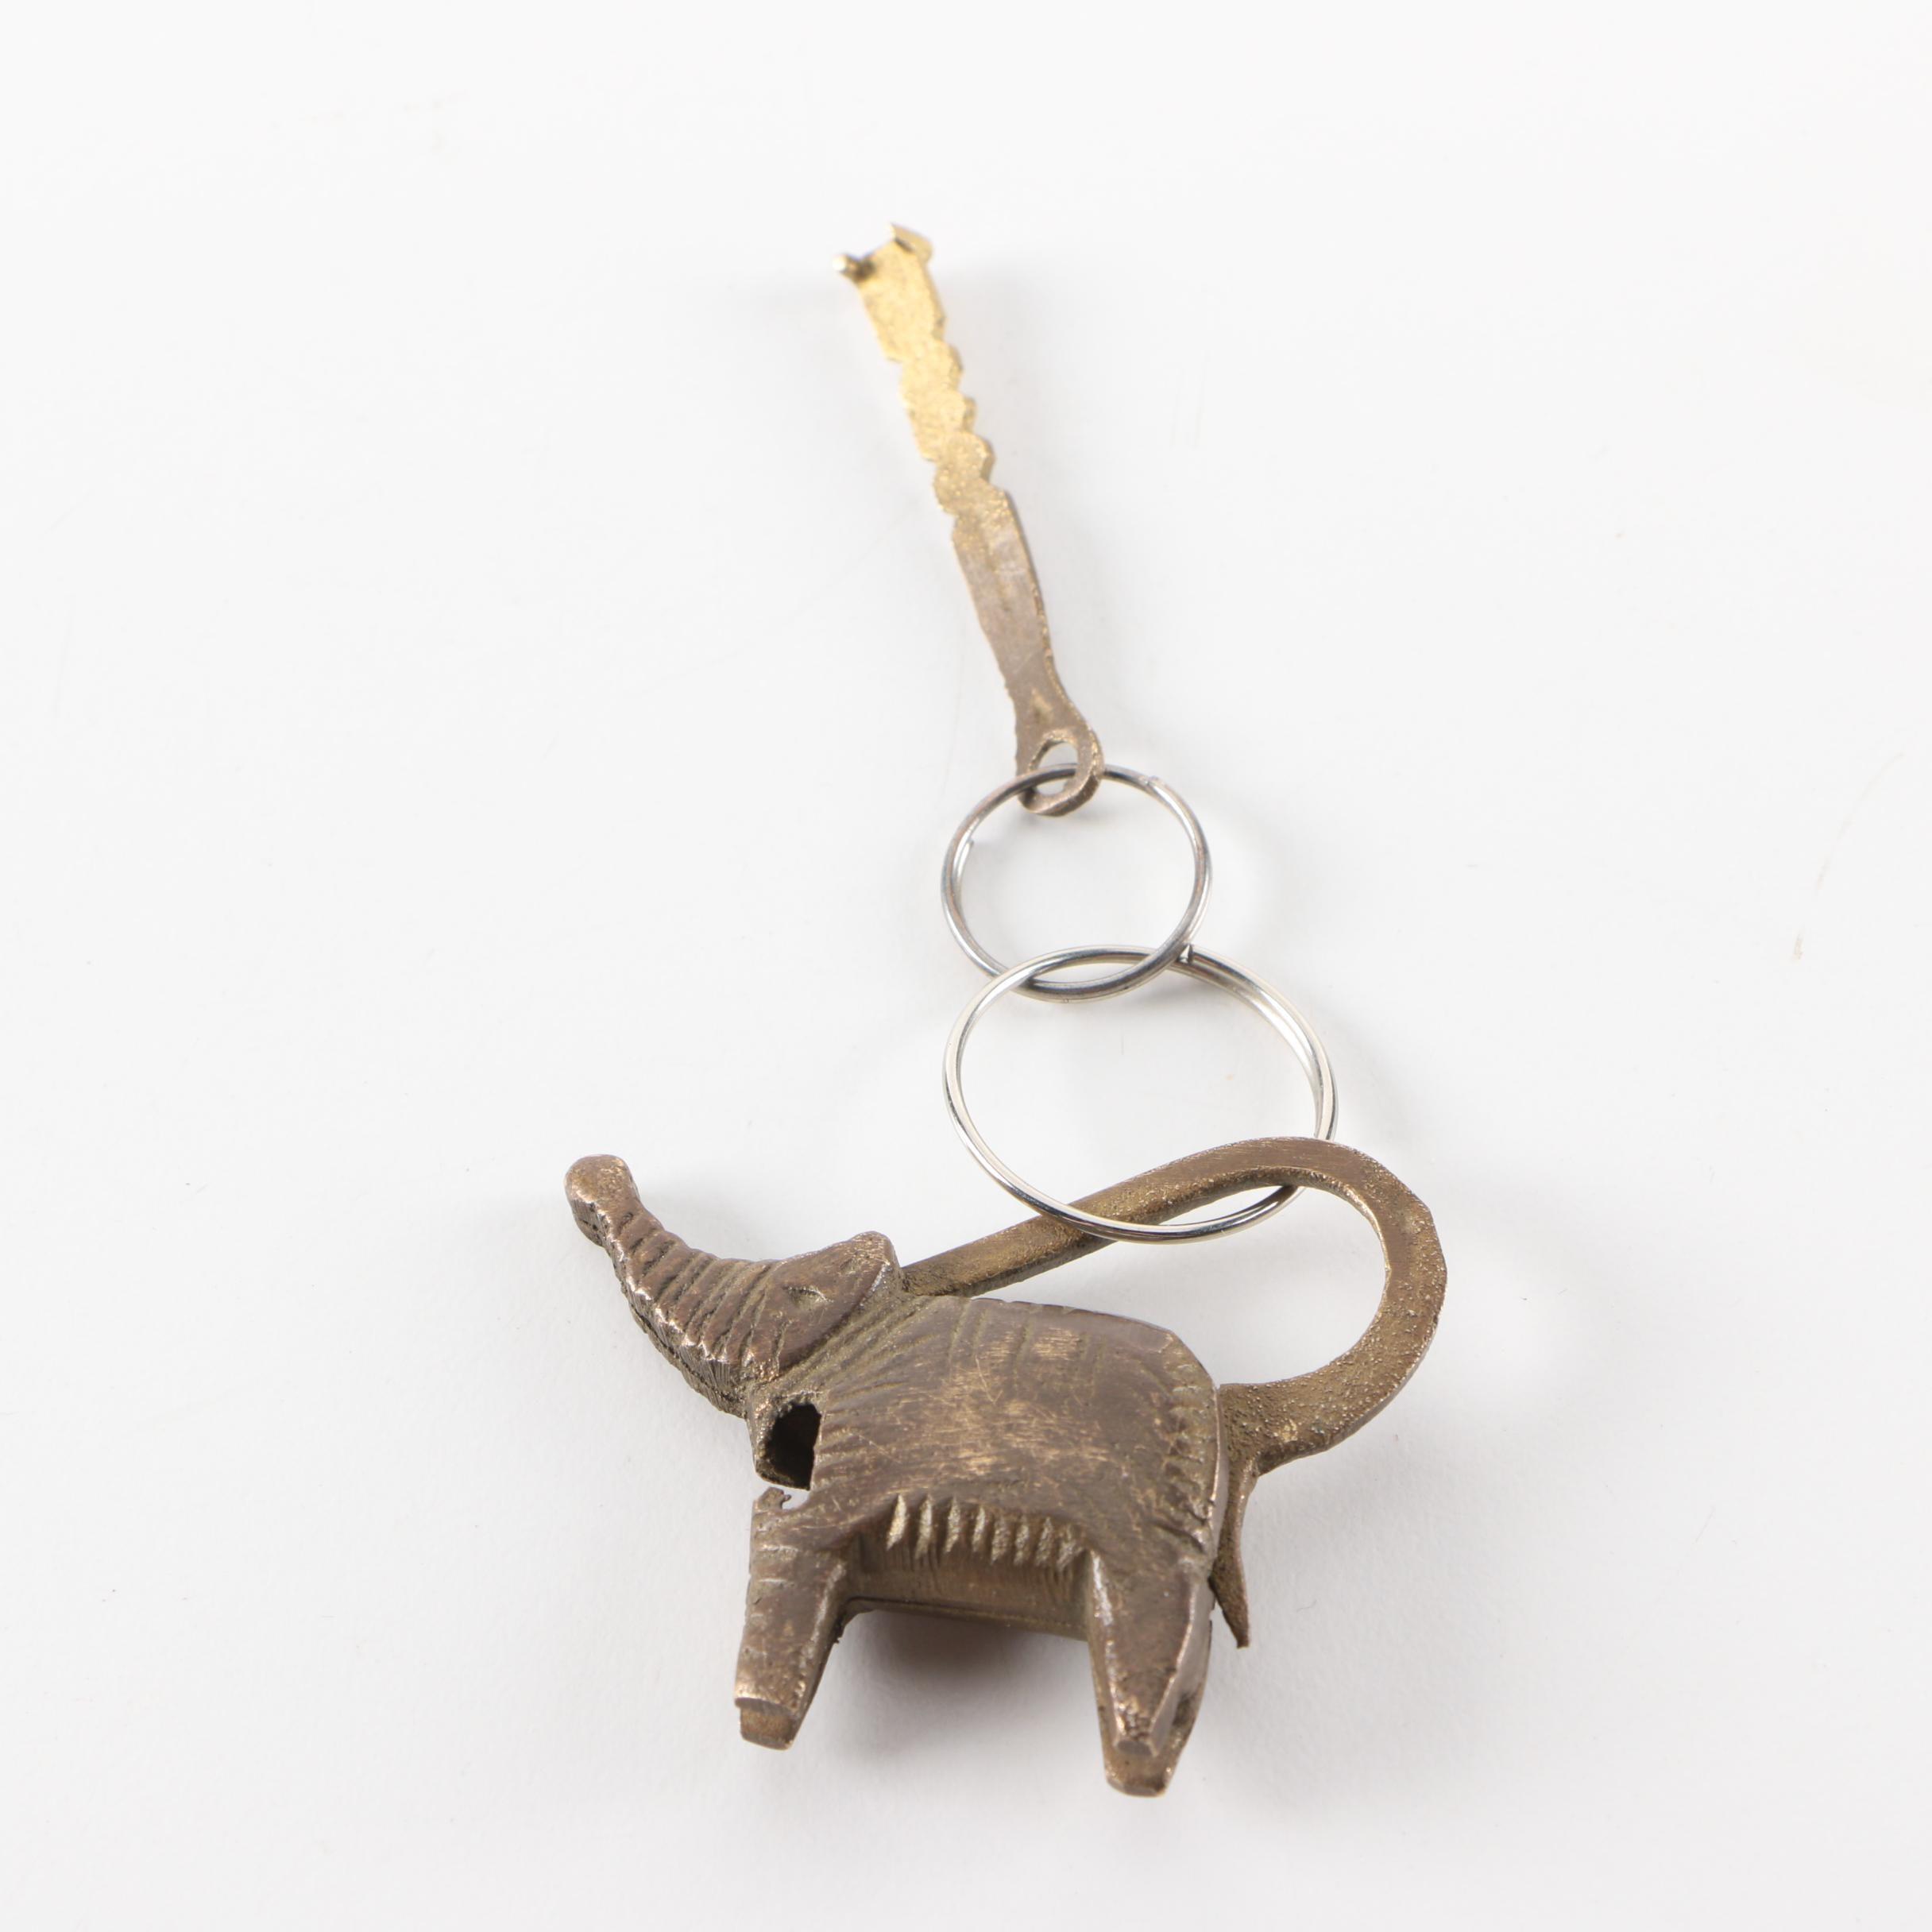 Vintage Brass Figural Elephant Padlock